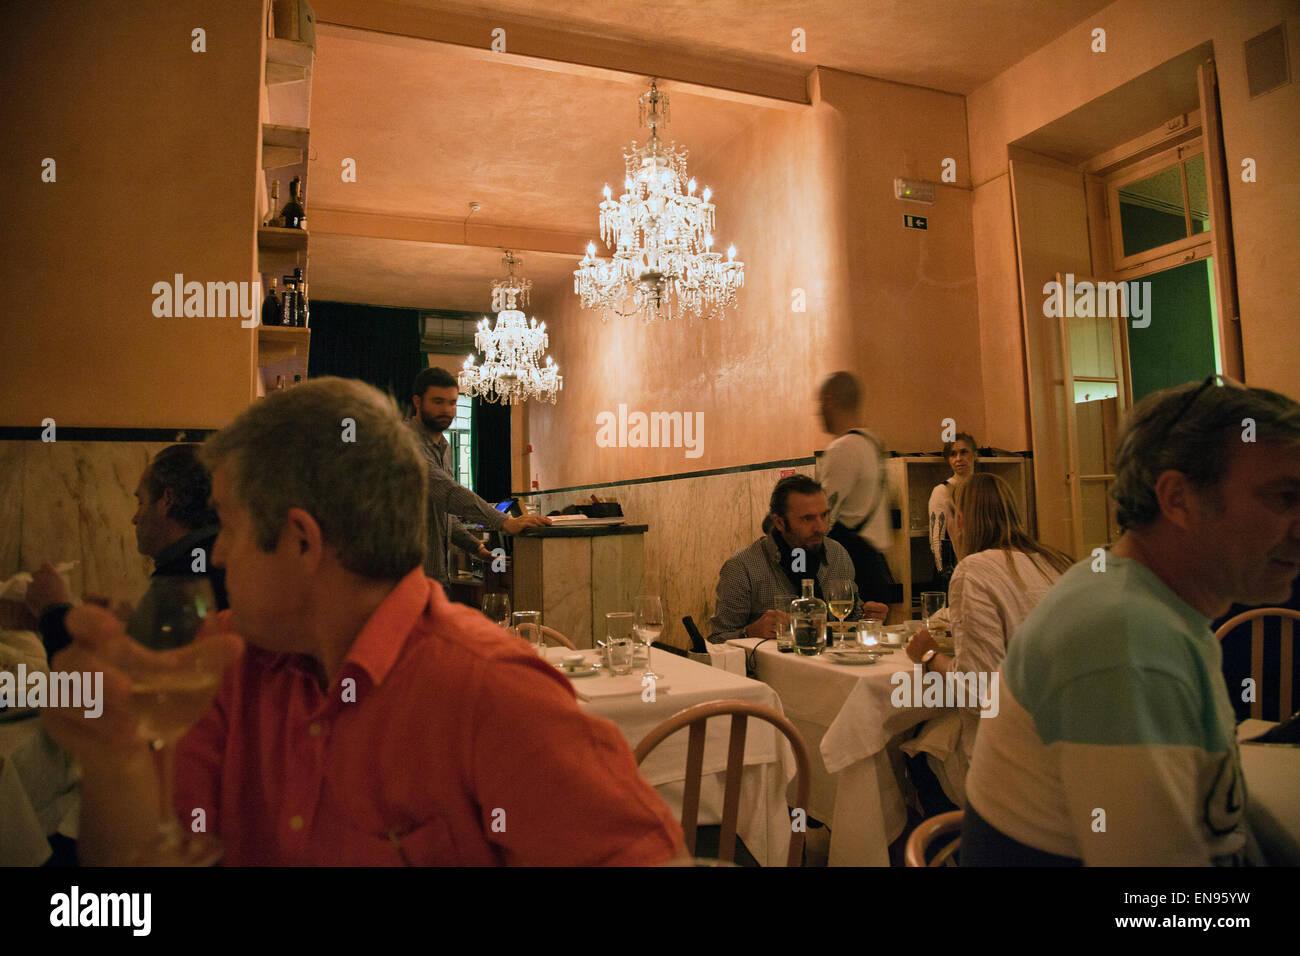 Pap' Acorda Restaurant Dining Interior in Bairro Alto in Lisbon - Portugal - Stock Image